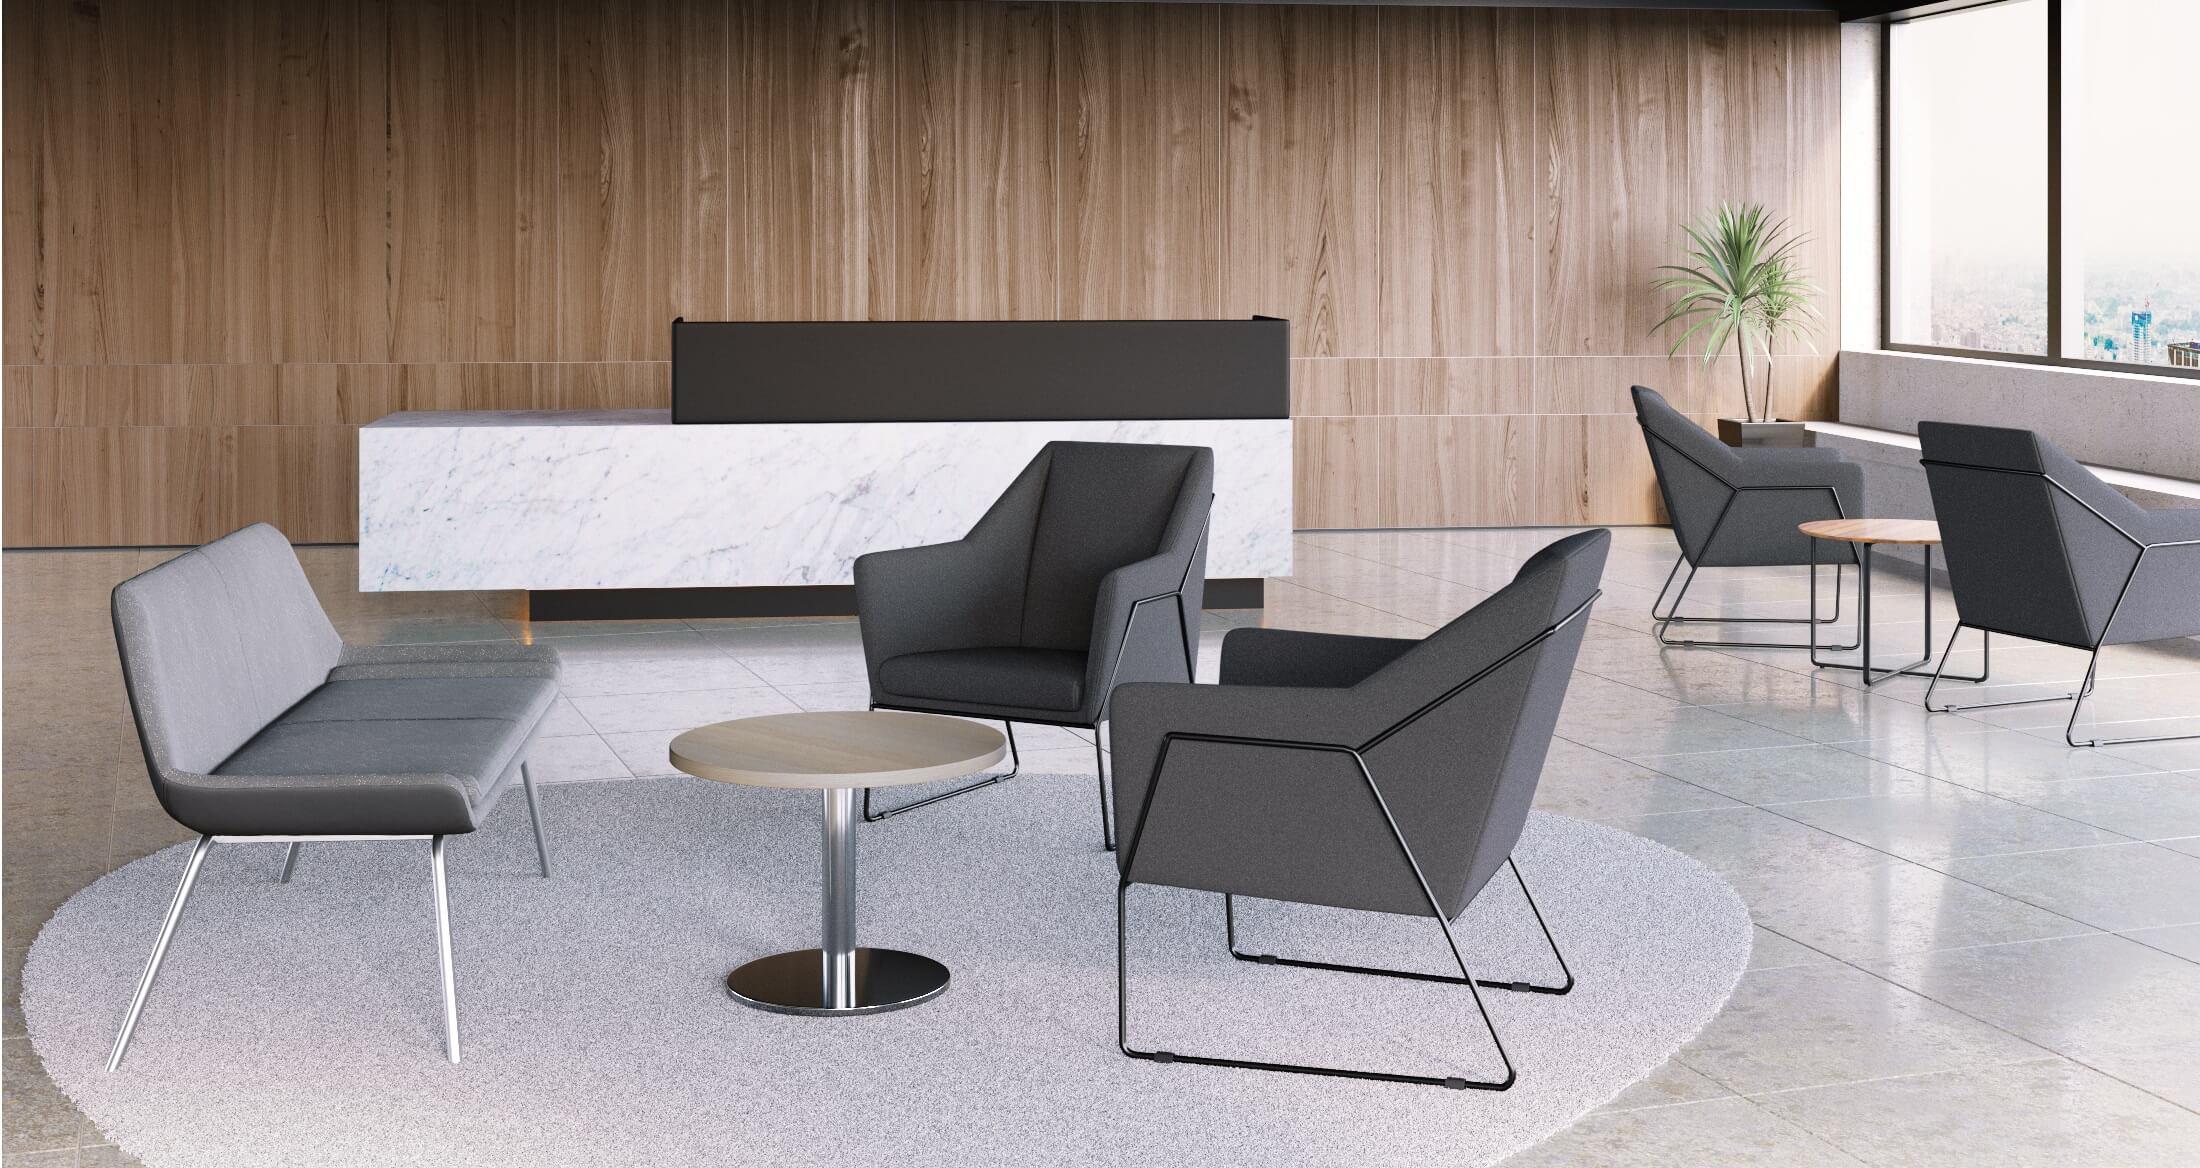 Scandis Reception Desk With Audo Reception Lounges